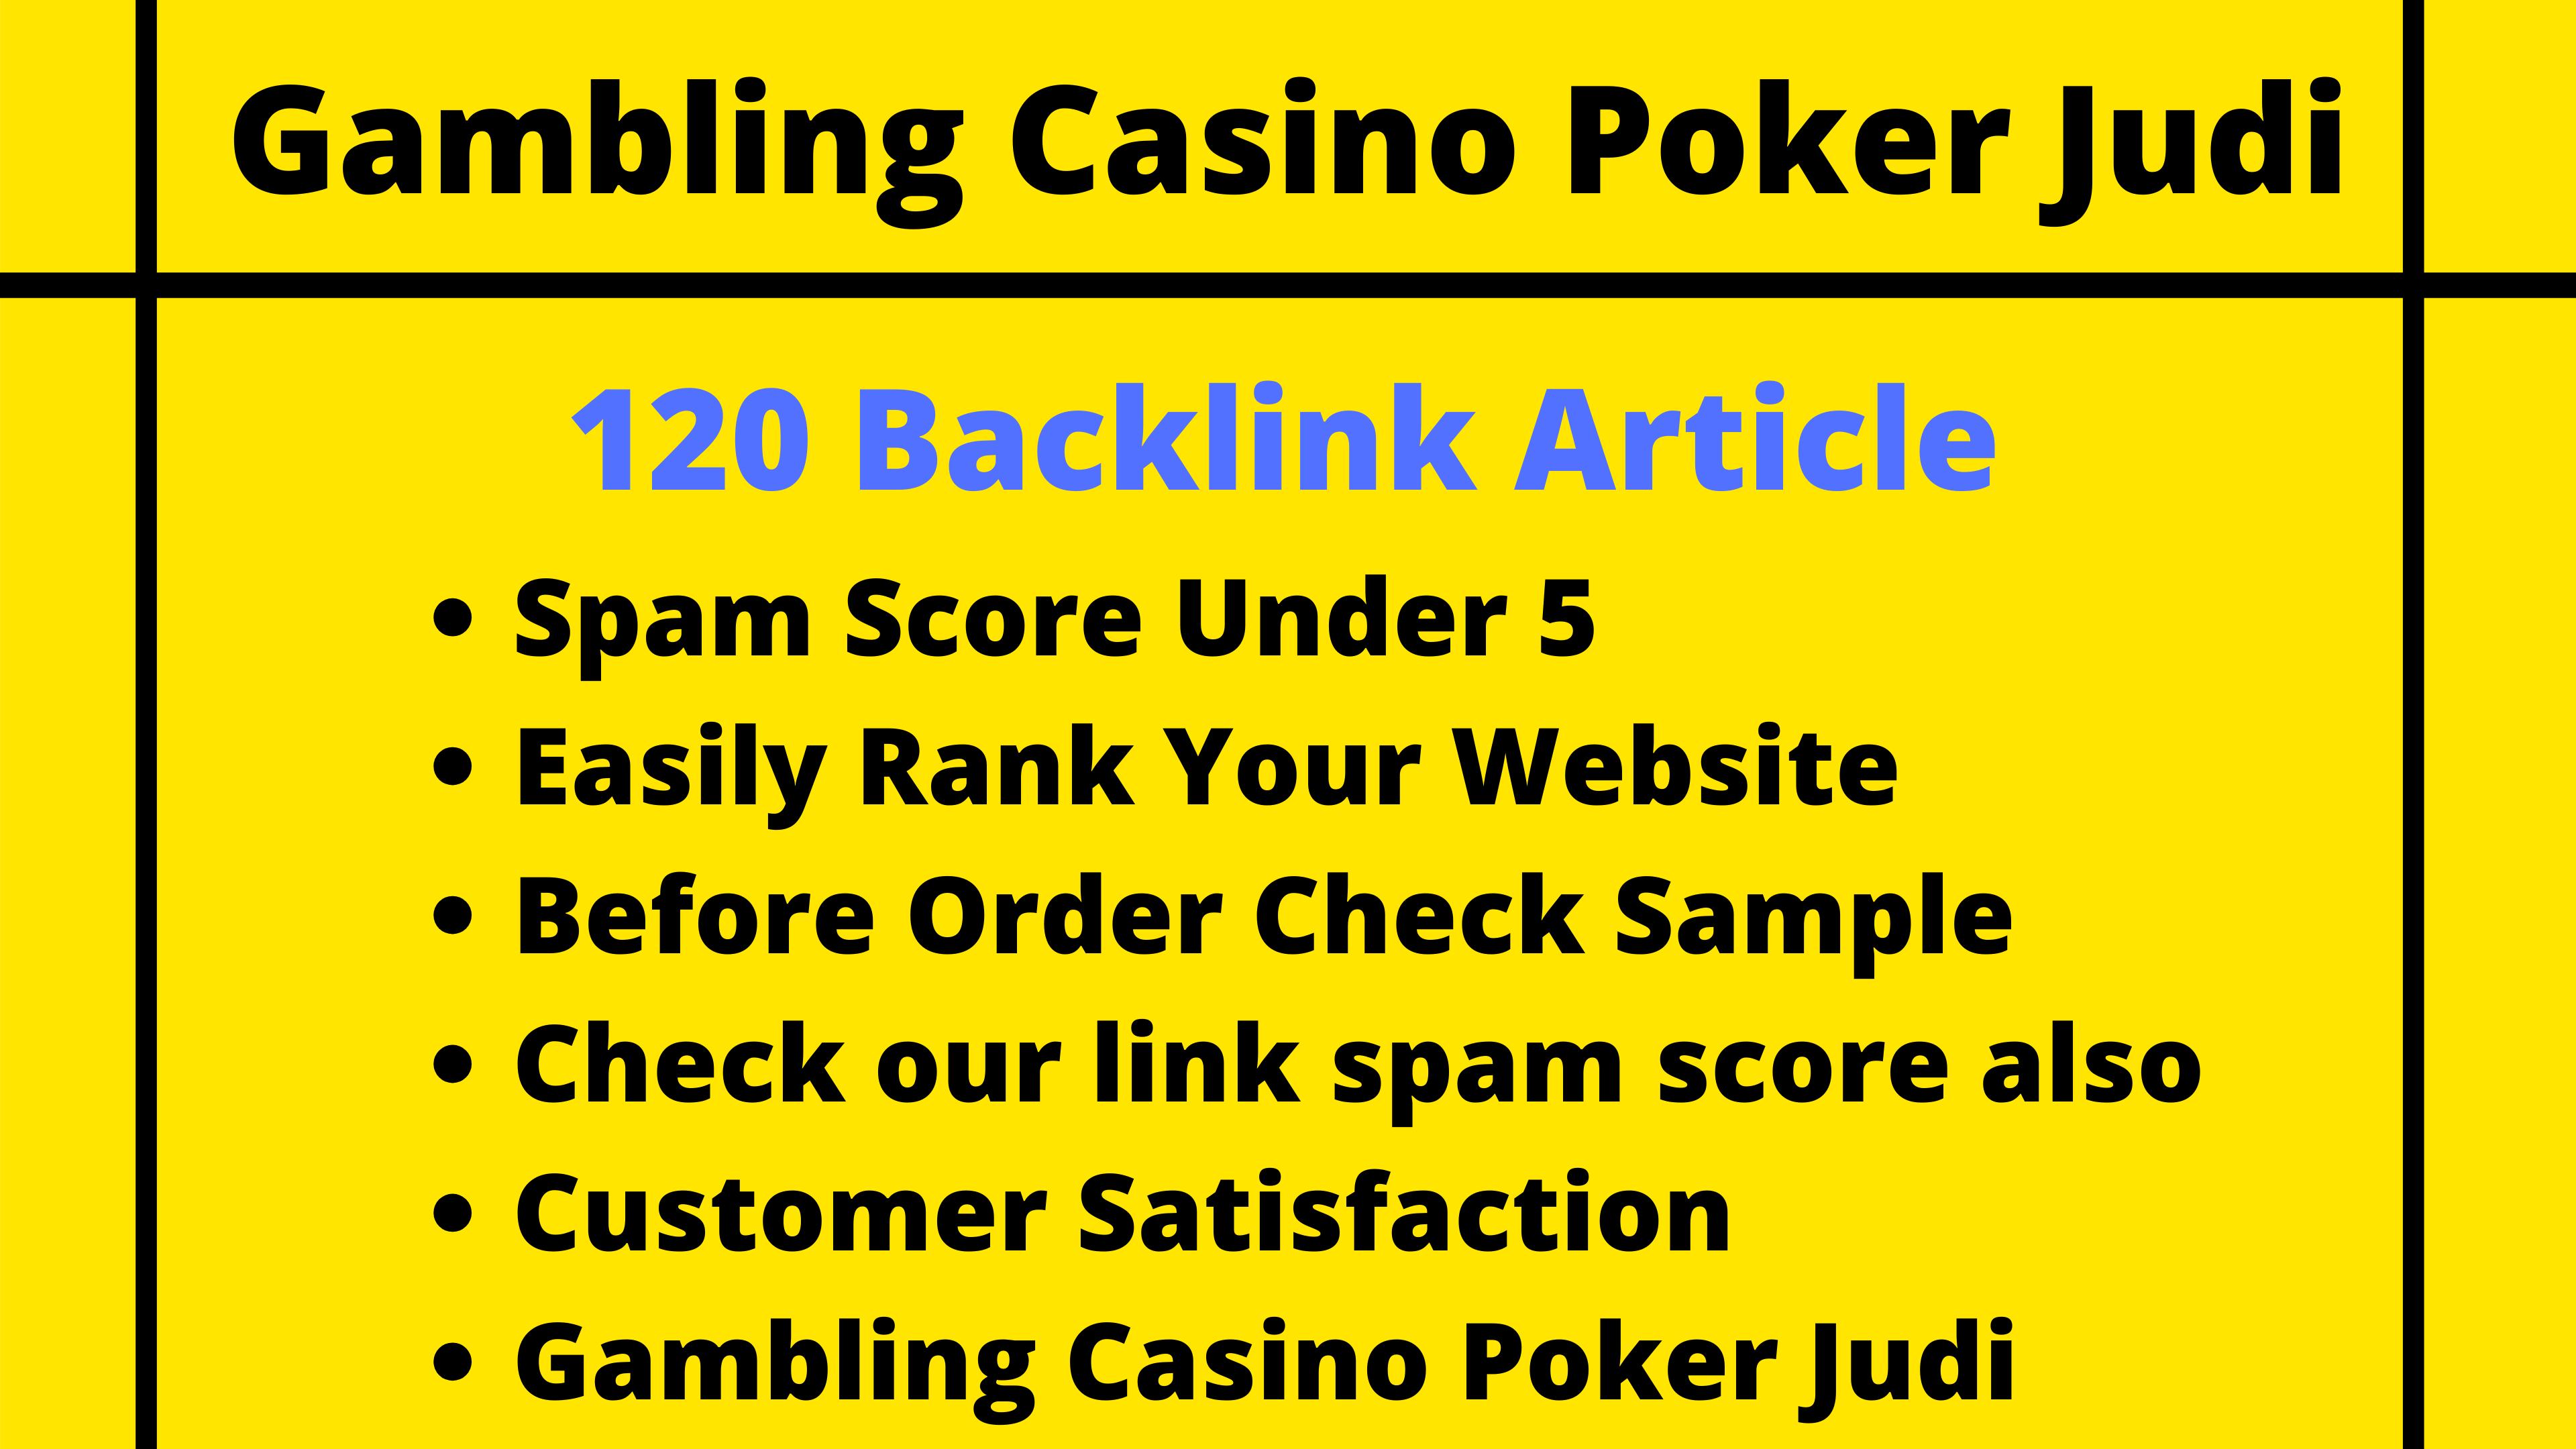 Gambling Casino Poker Judi 120+ SEO Dofollow Backlink